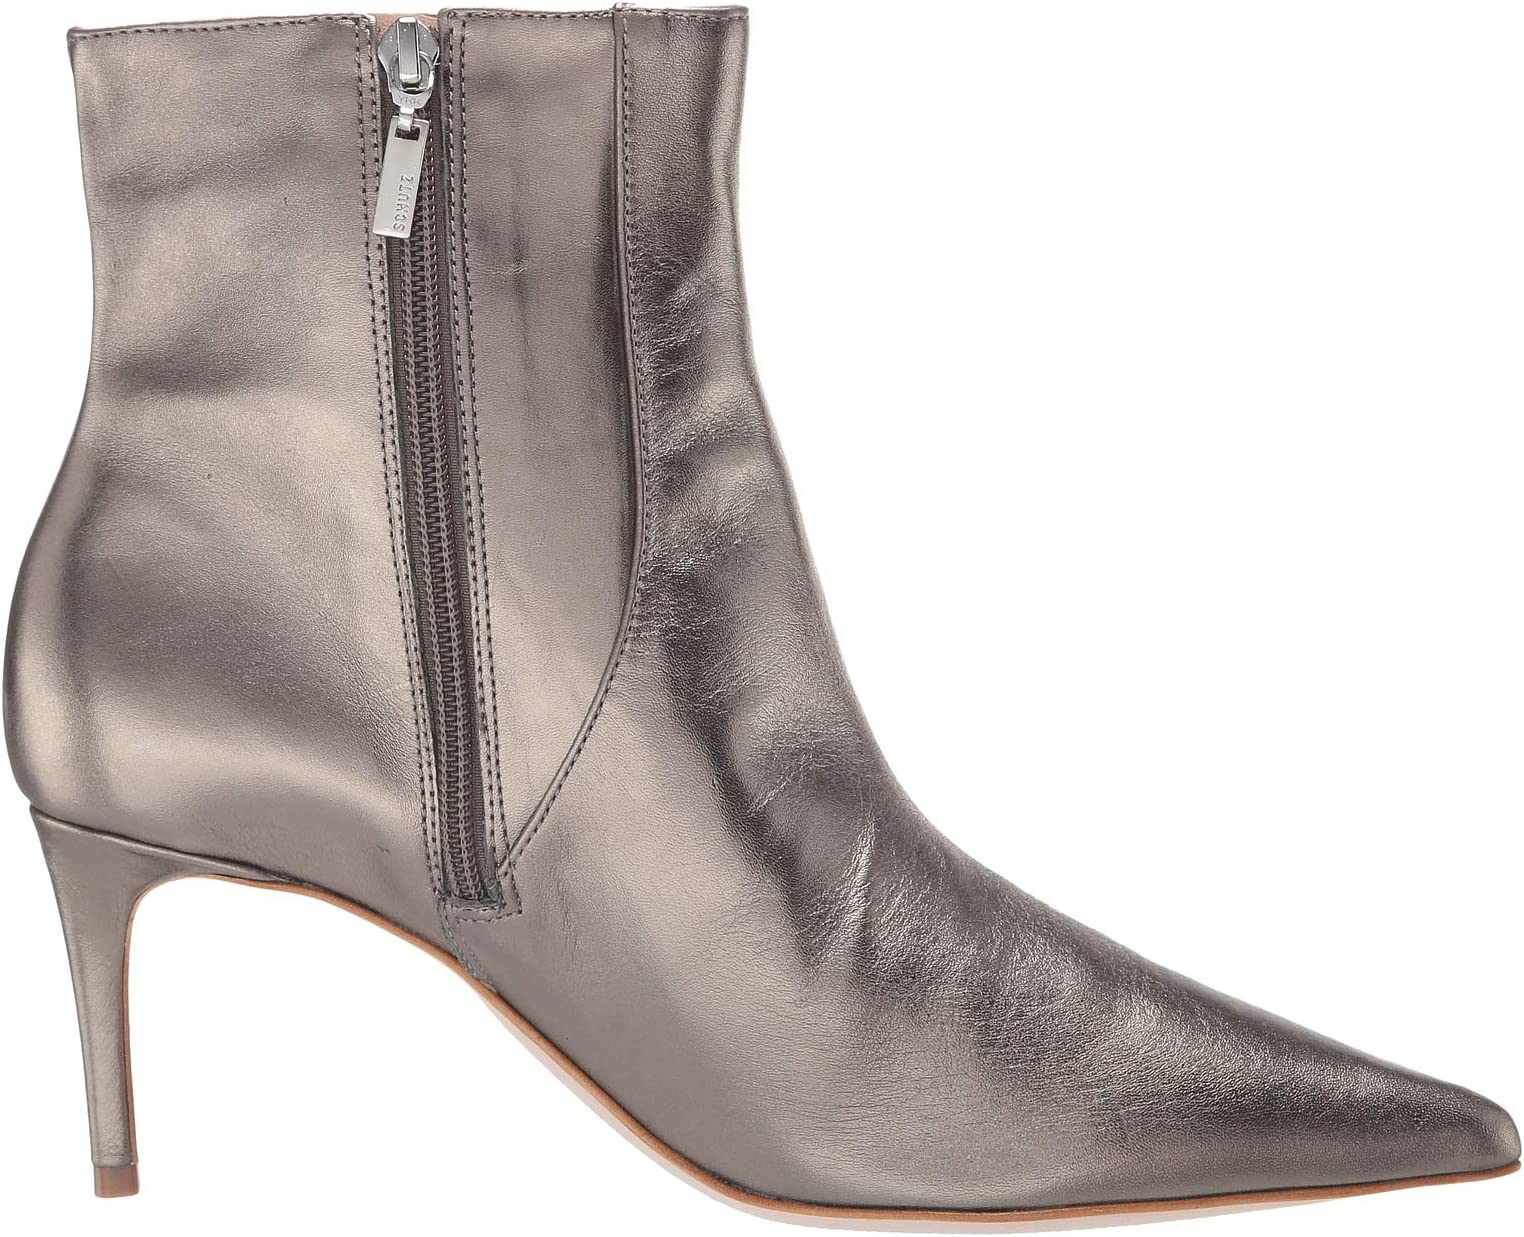 Schutz Bette | Women's shoes | 2020 Newest